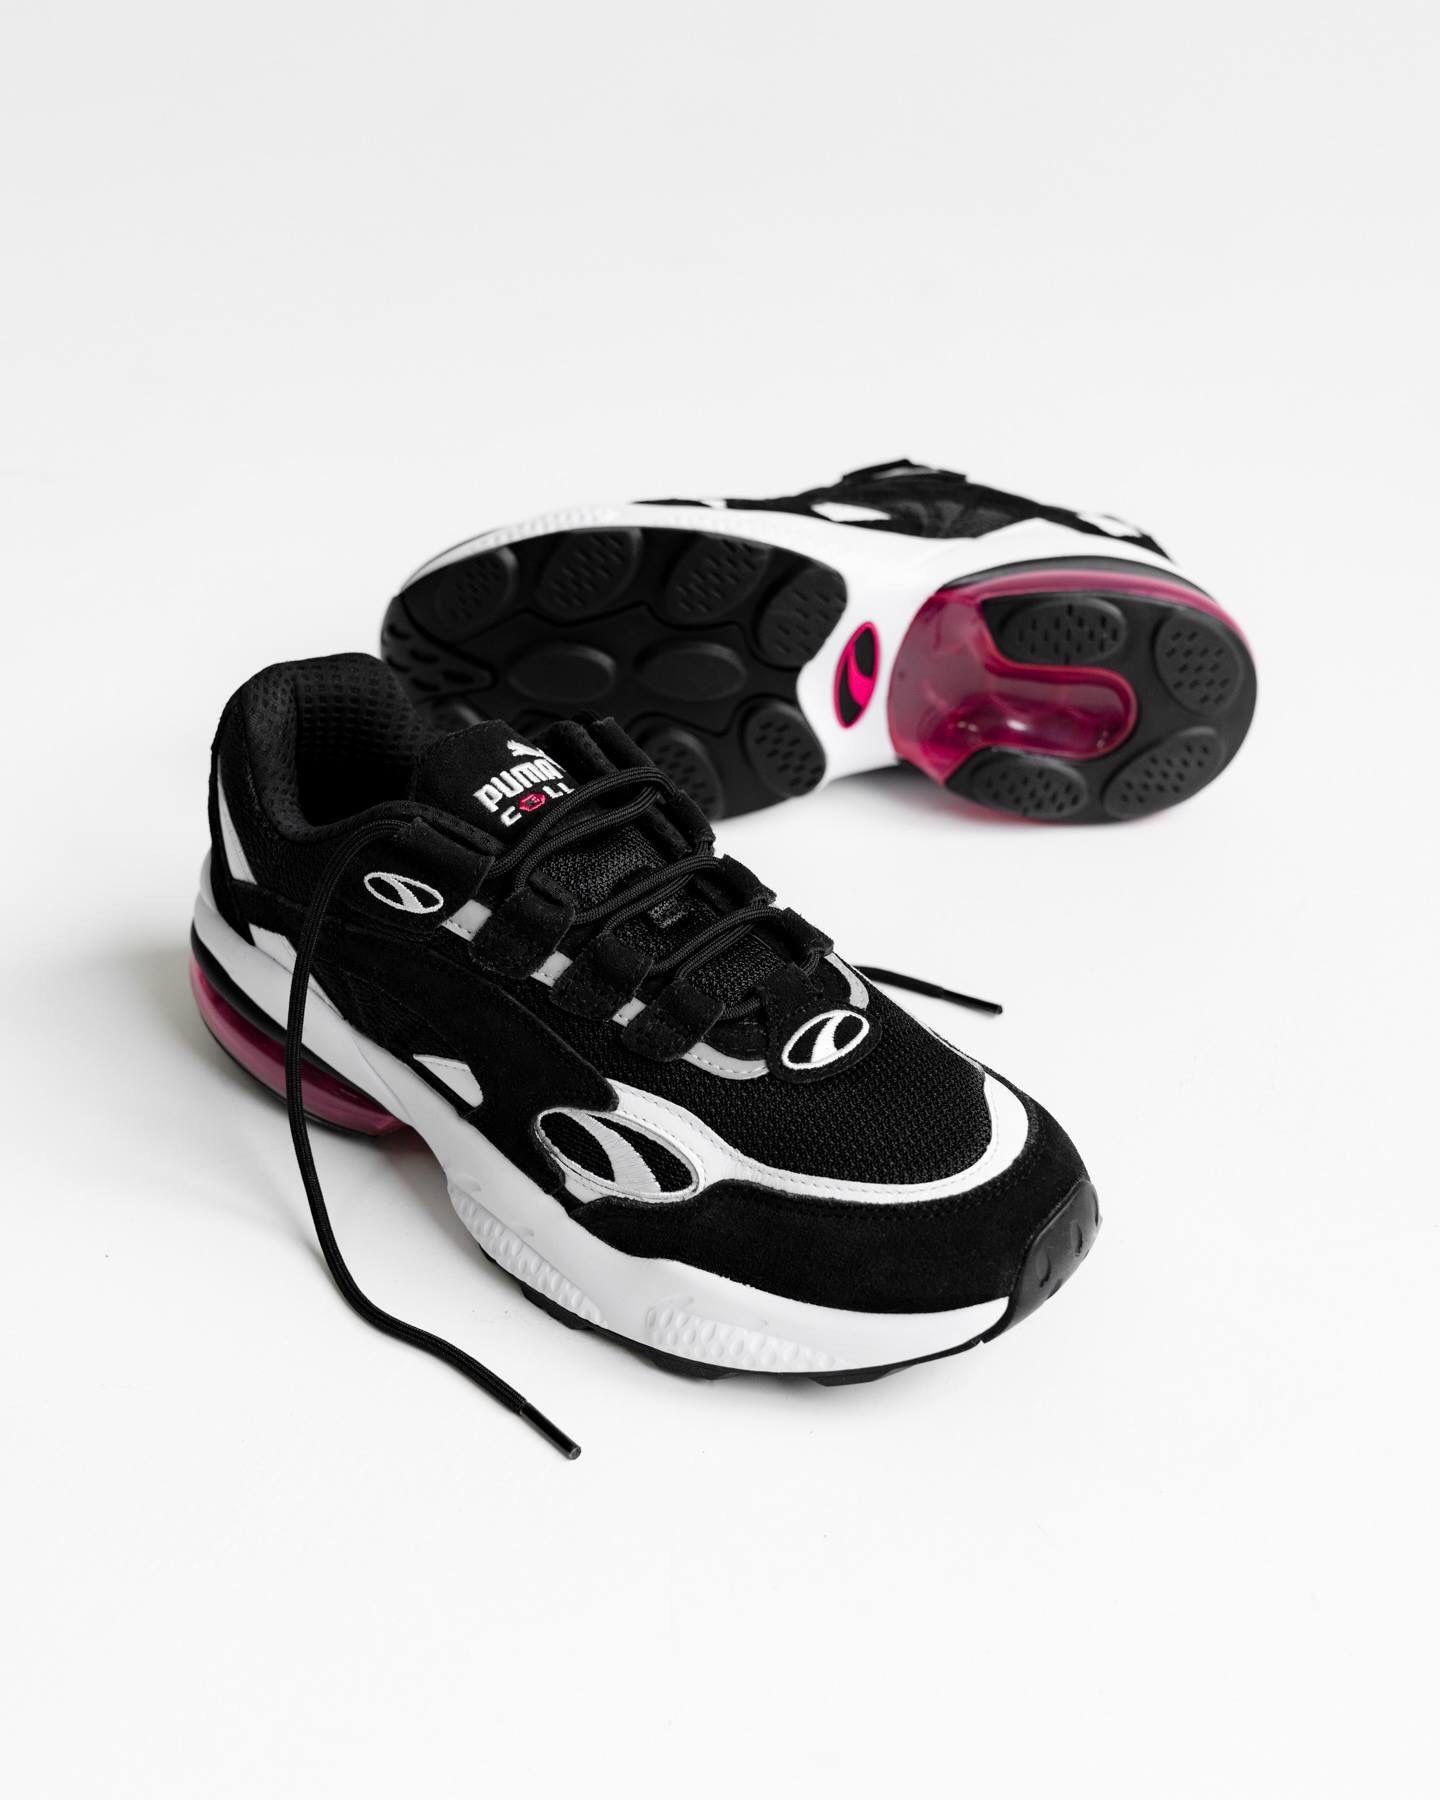 PUMA Sneaker 'Cell Venom Animal' in braun weiß   ABOUT YOU